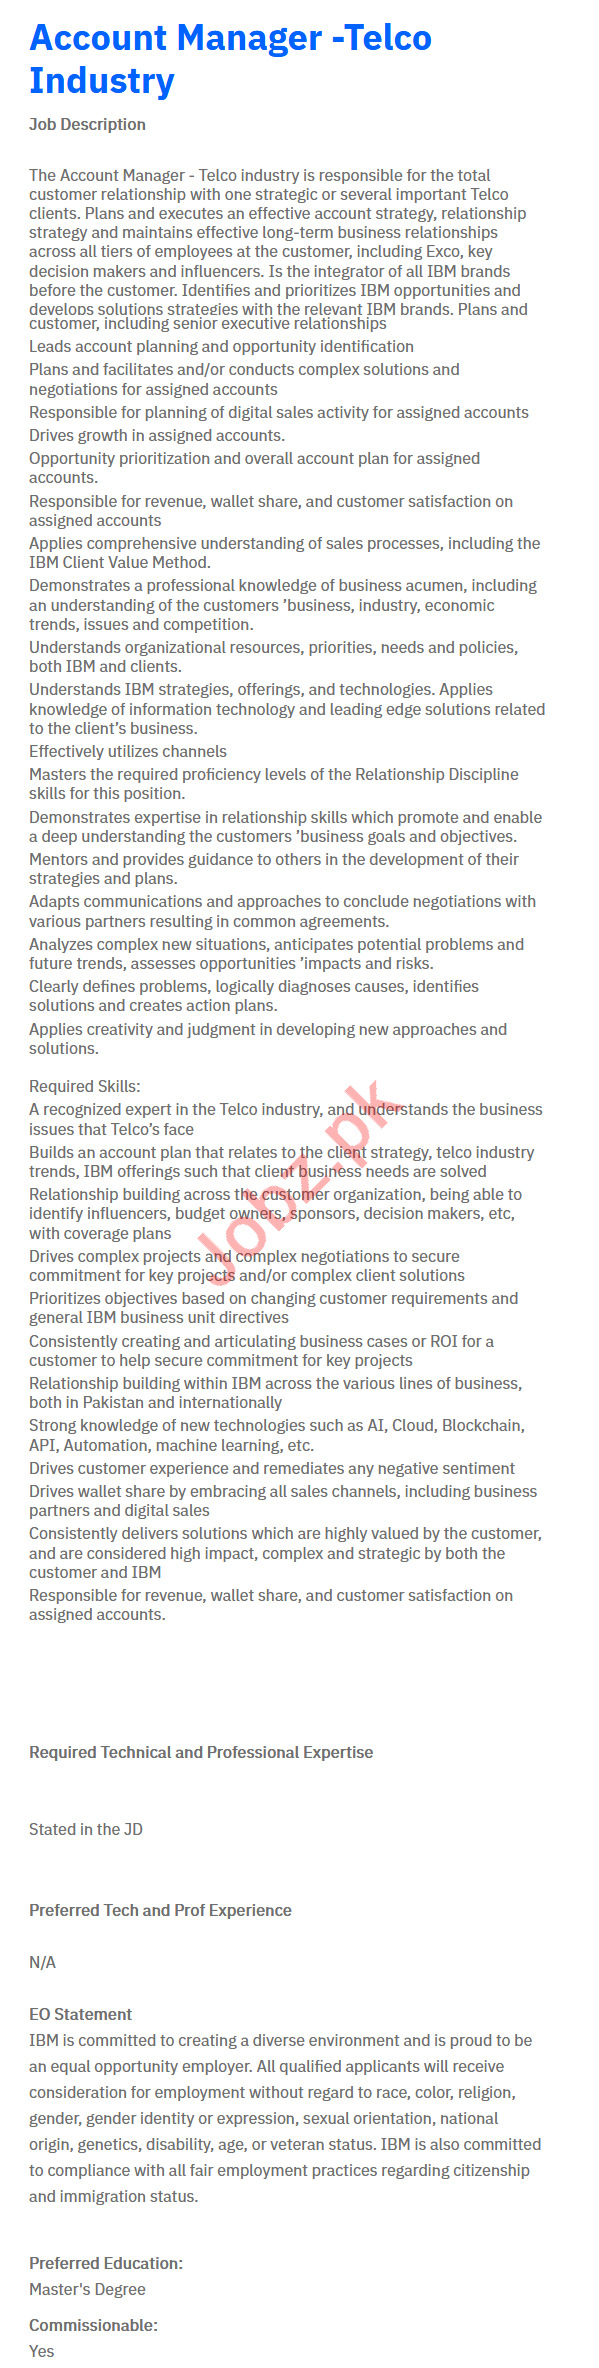 IBM Pakistan Accounts Manager Job in Islamabad